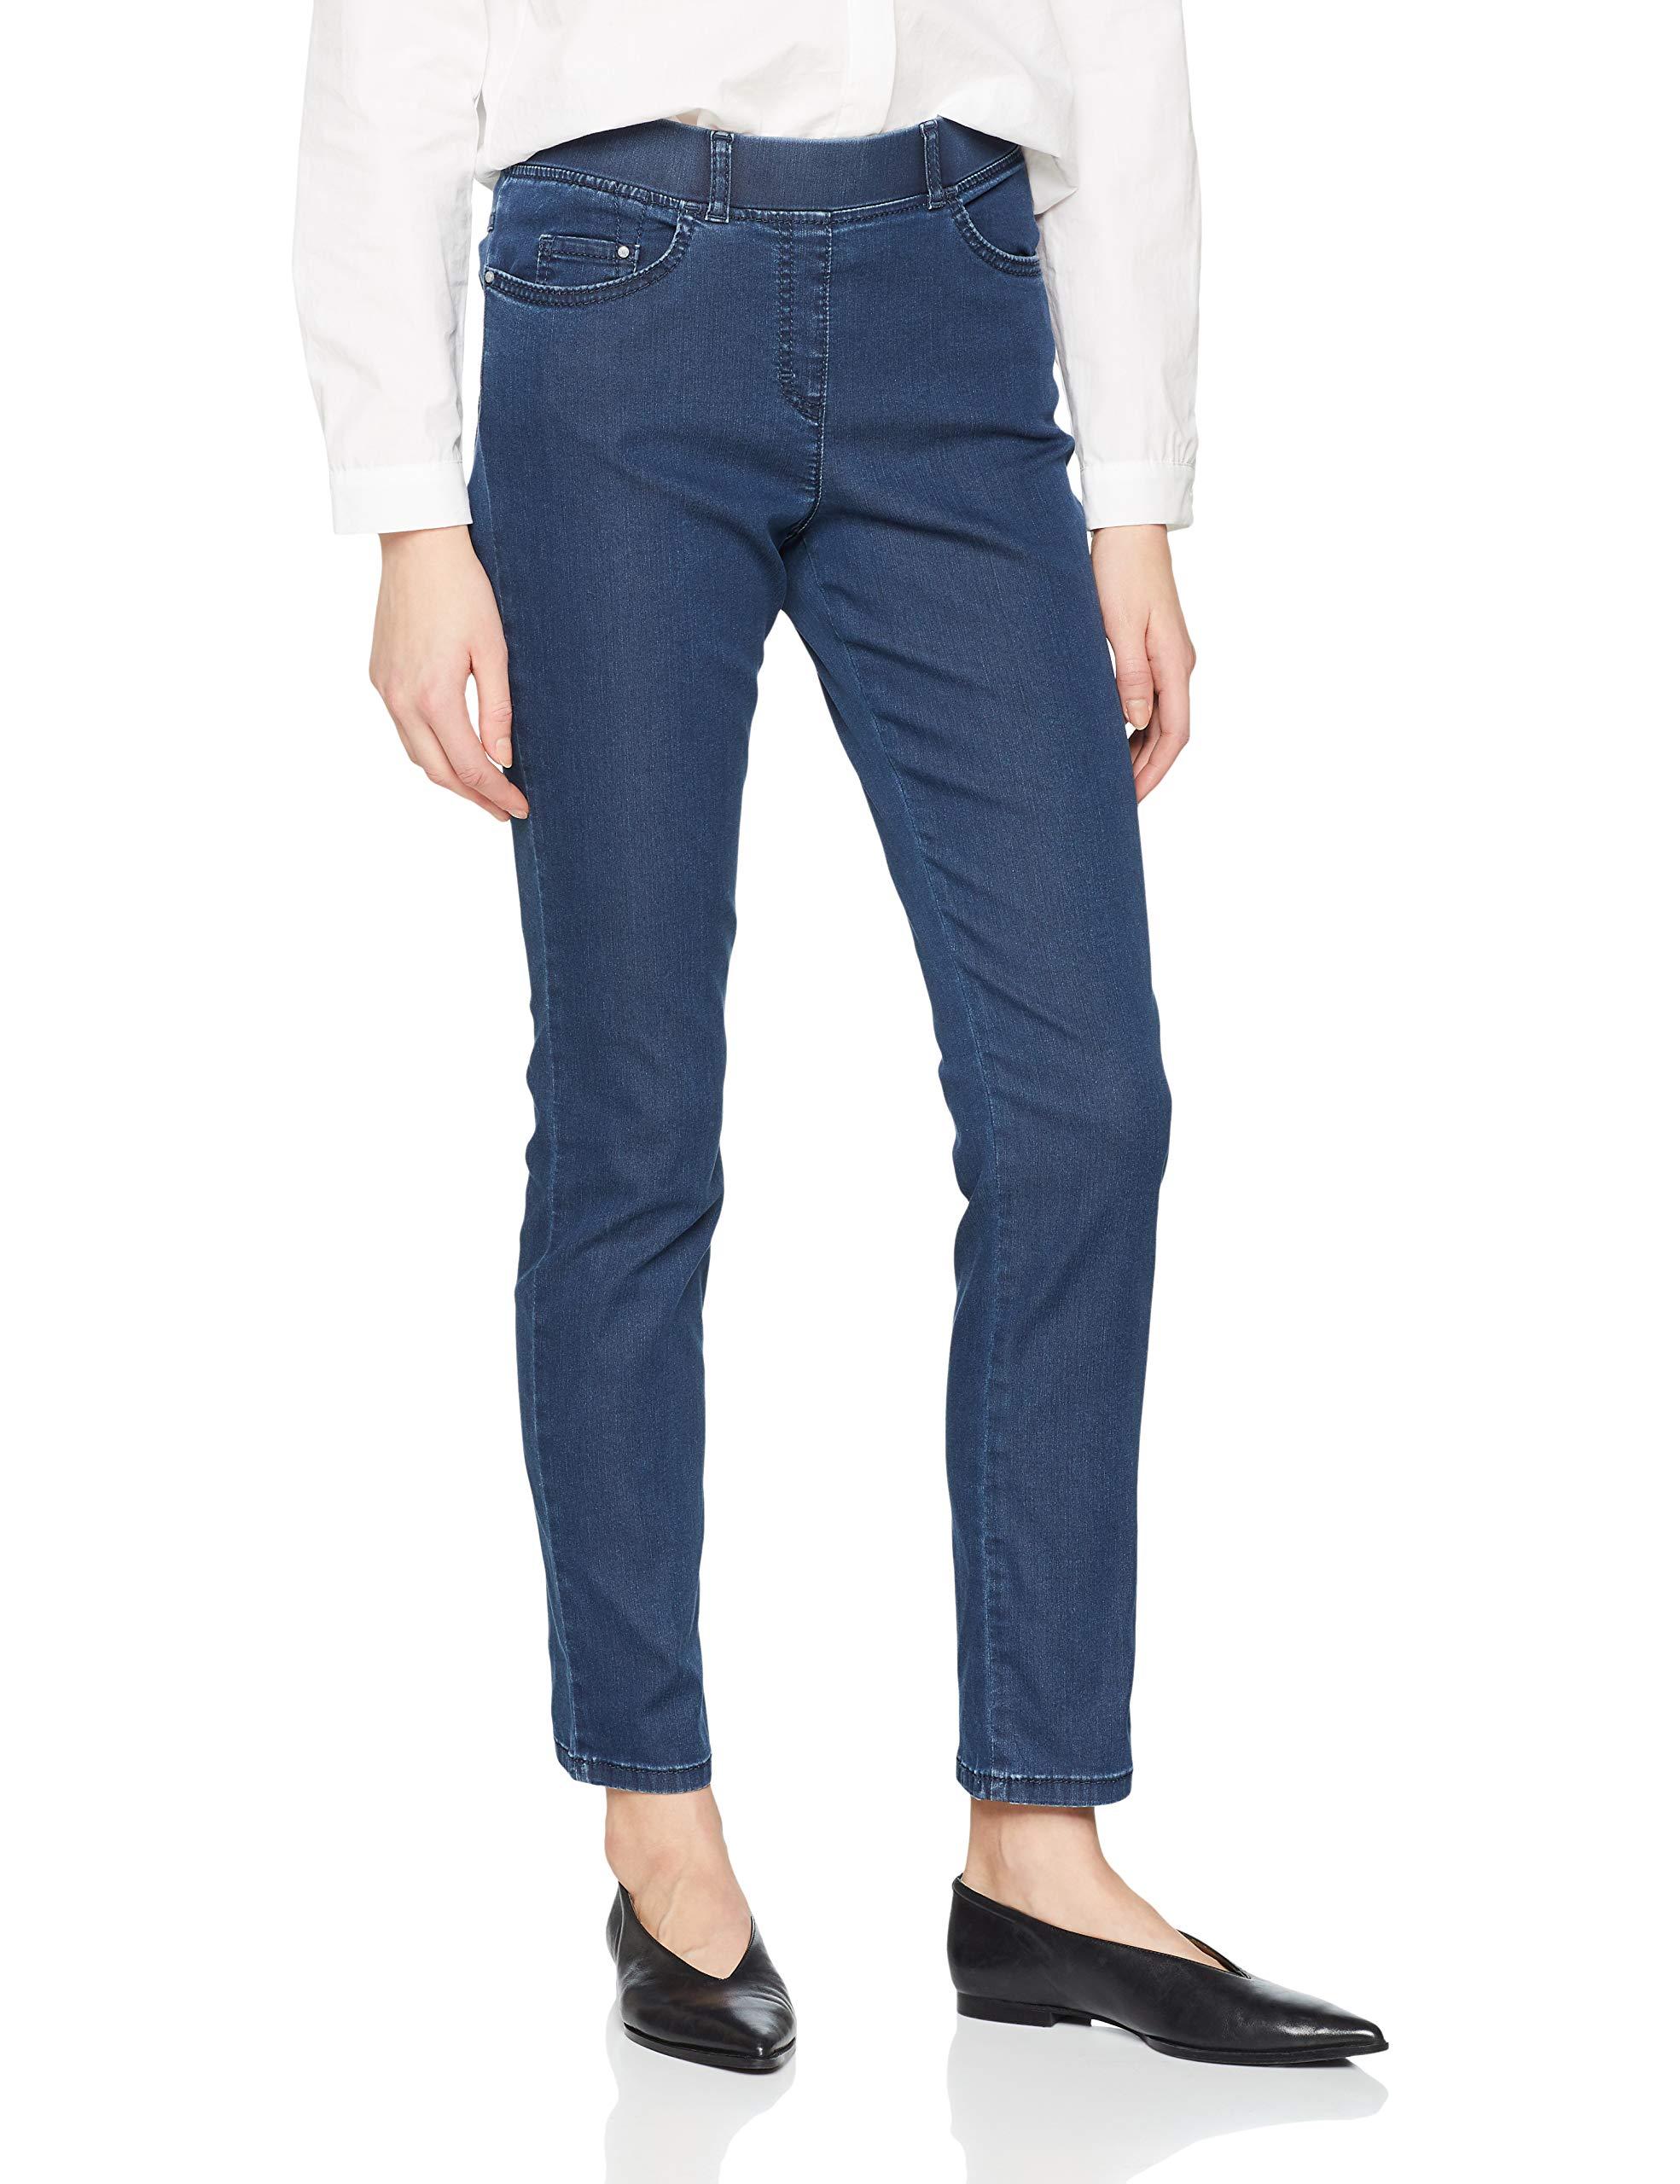 By l32taille 12 LavinaSuper Fabricant42k jean Skinny bleustoned Slim femme Brax 6207 Raphaela 25w32 9YWE2IHbeD